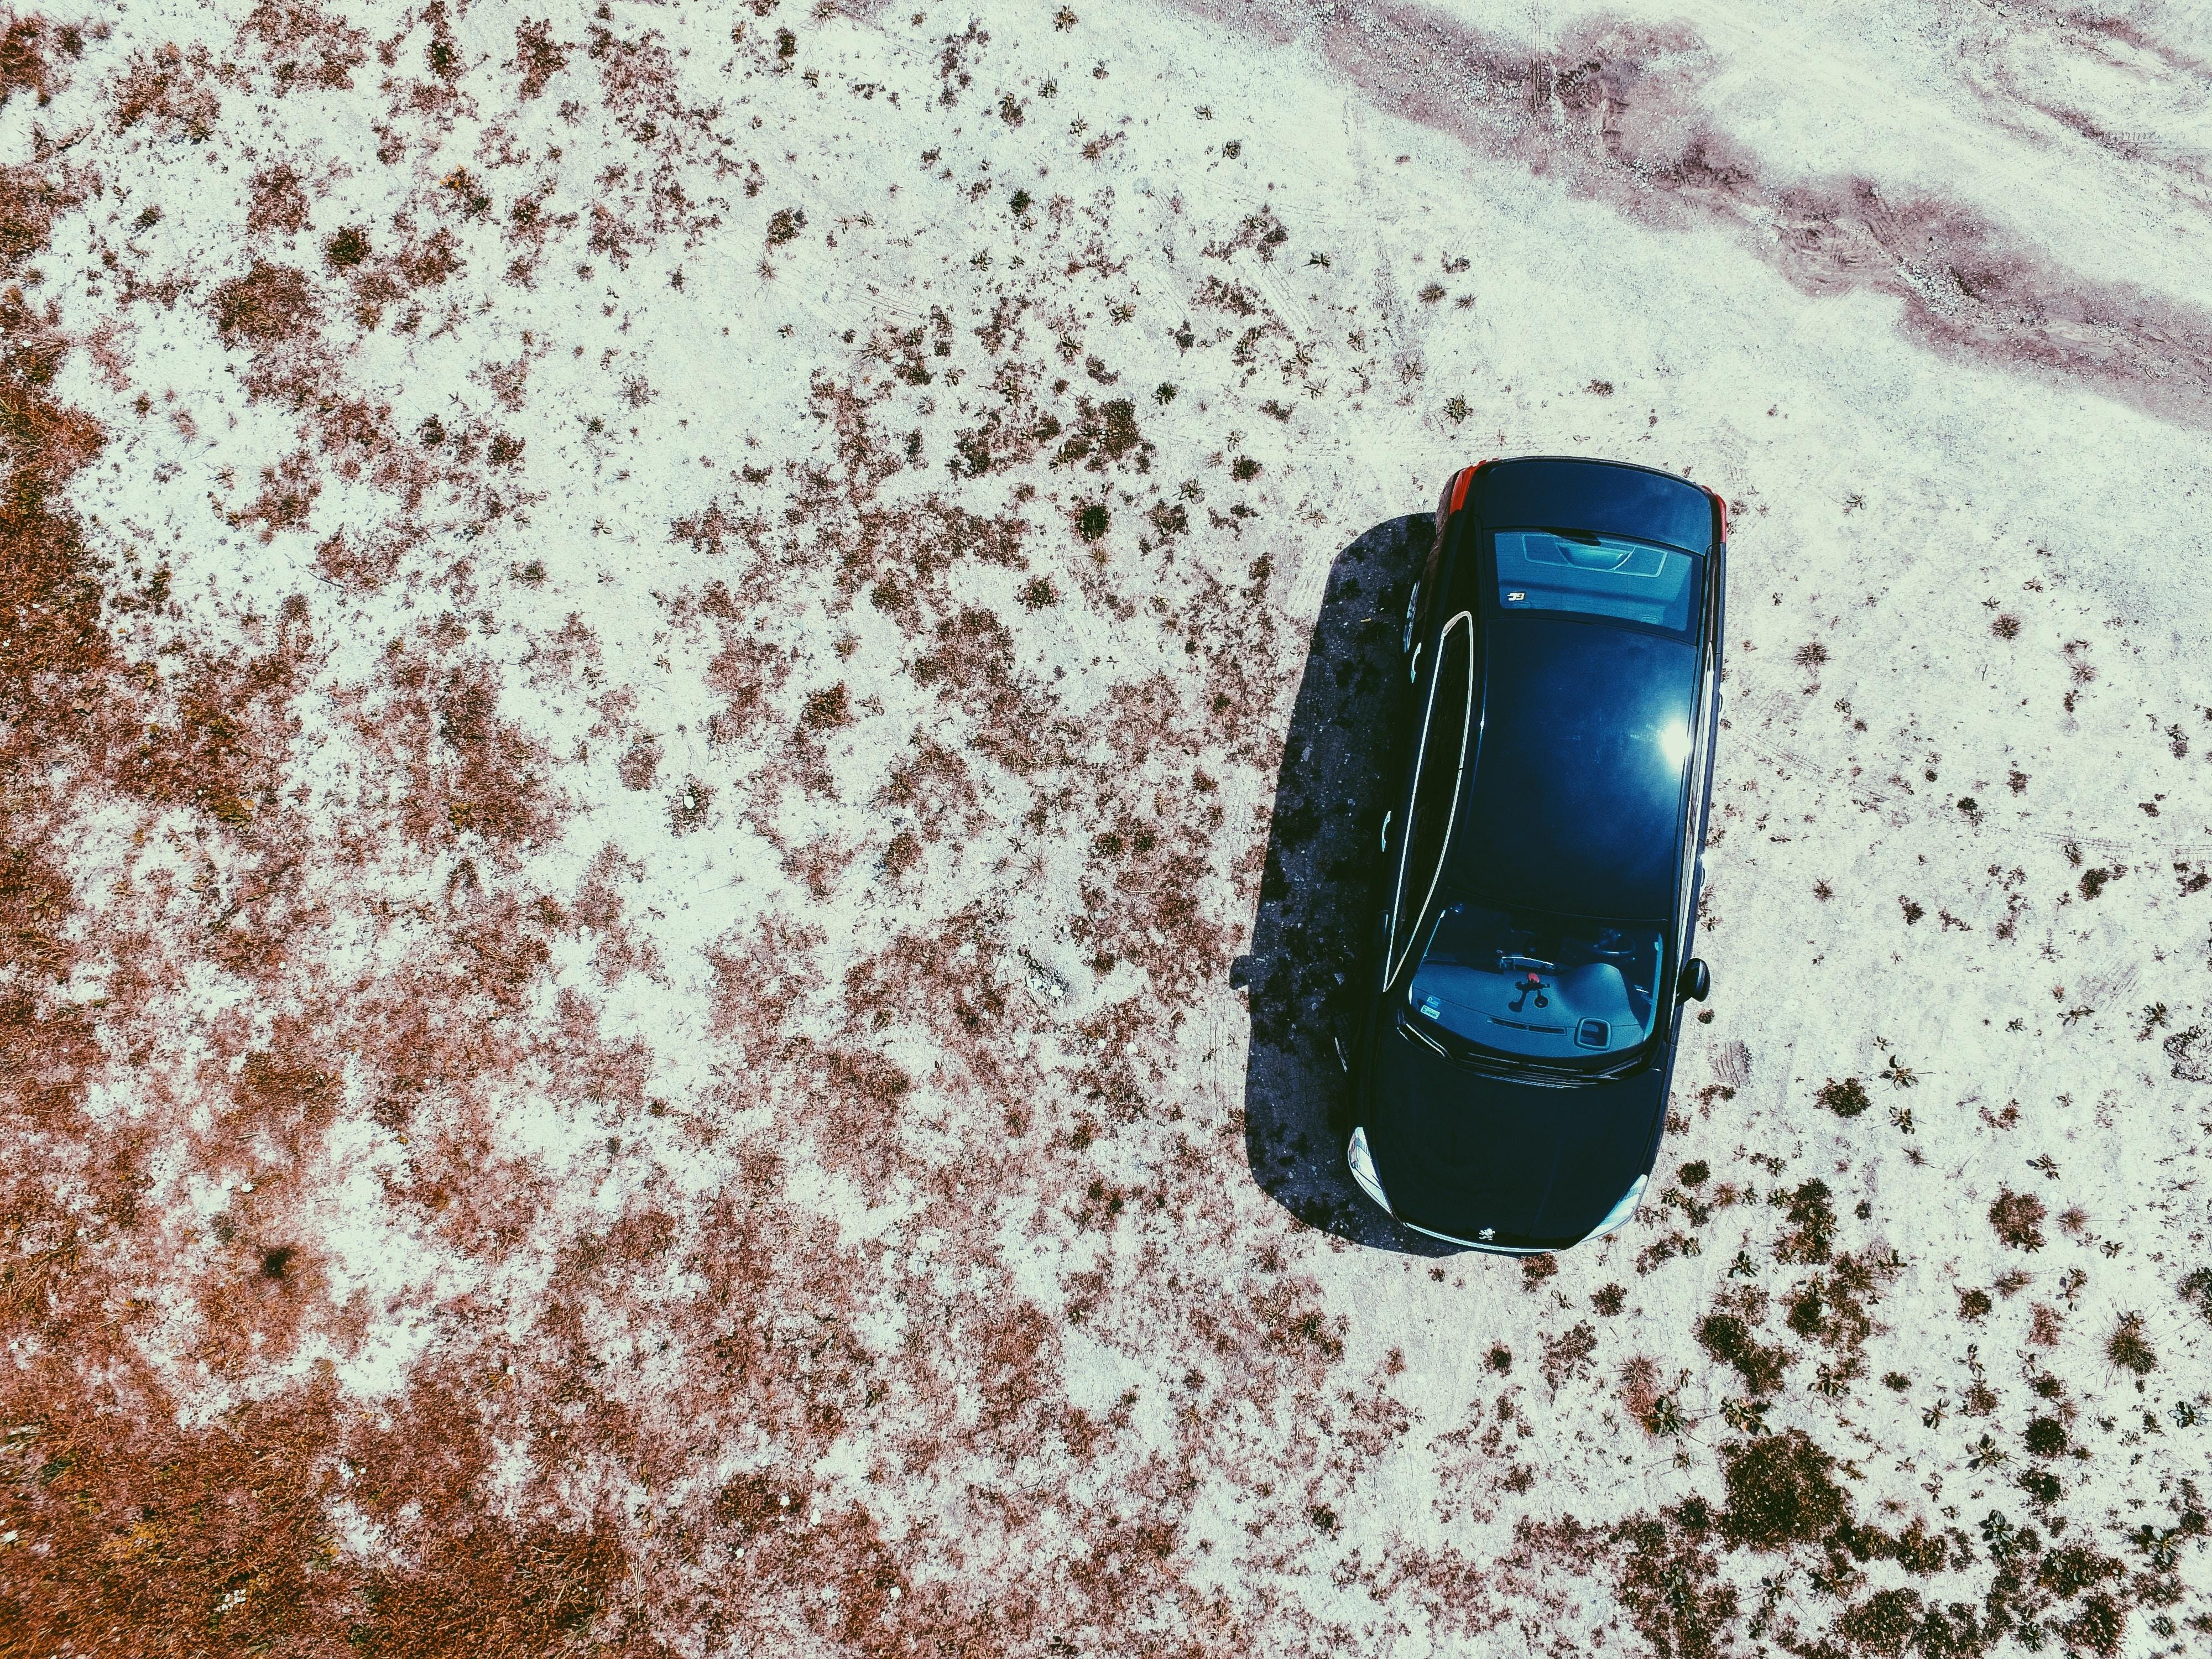 Drone shot of a black sedan automobile in the desert landscape.